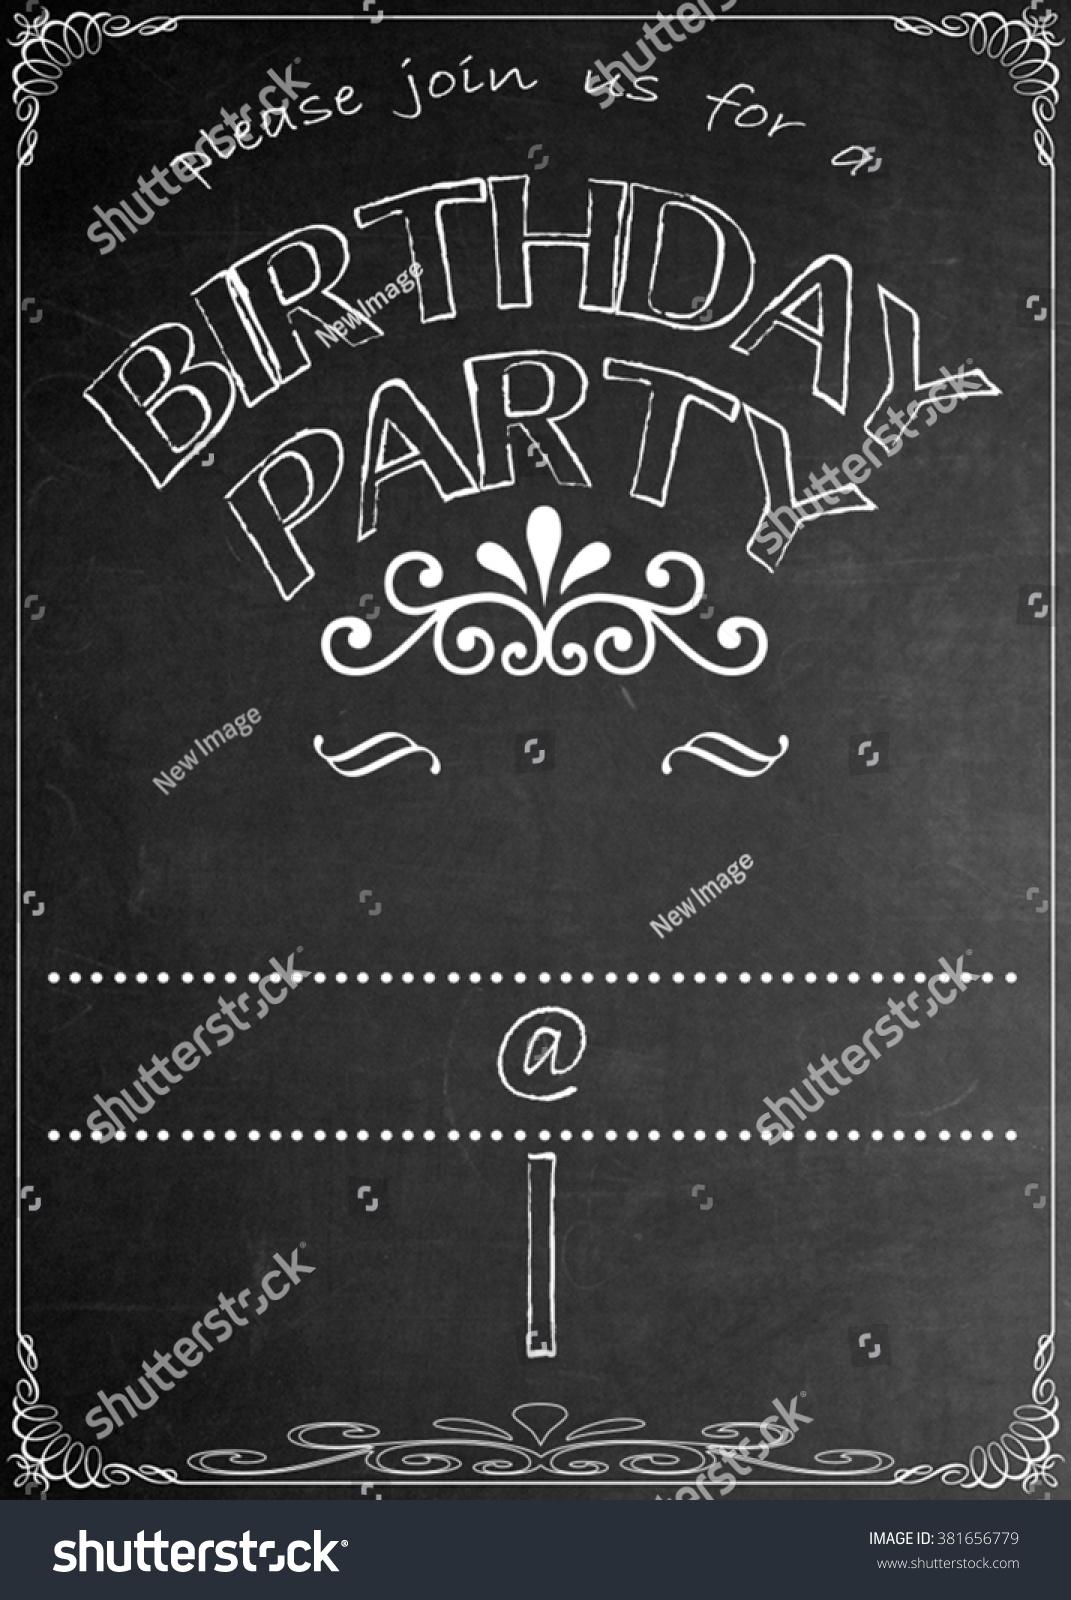 https www shutterstock com image illustration chalkboard birthday party invitation blackboard celebration 381656779